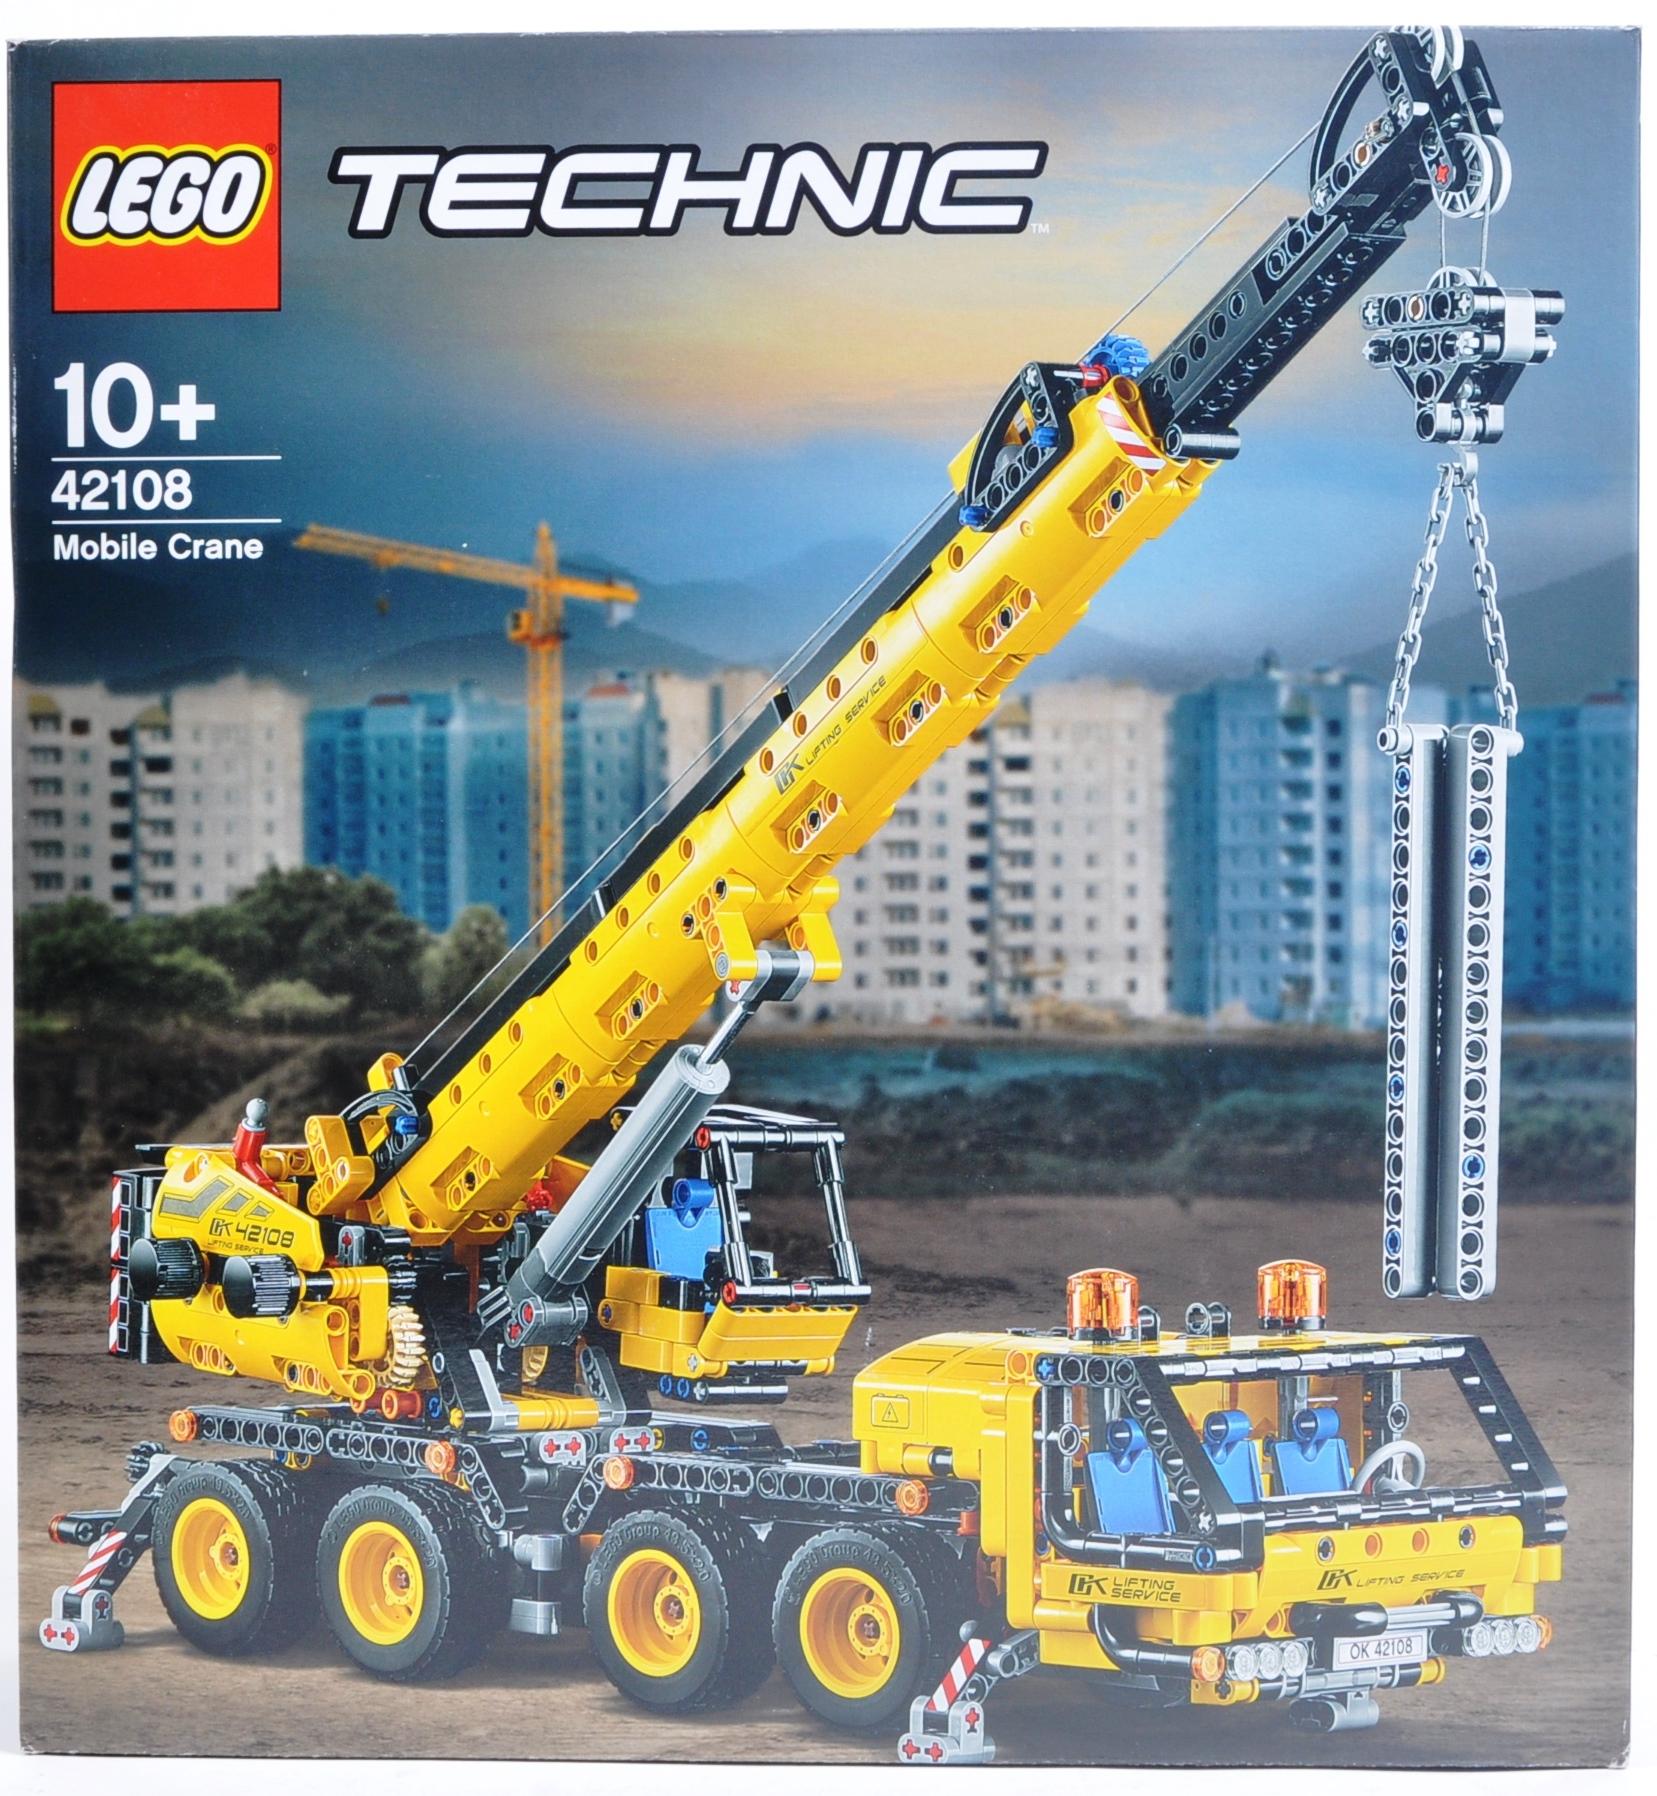 LEGO SET - LEGO TECHNIC - 42108 - MOBILE CRANE